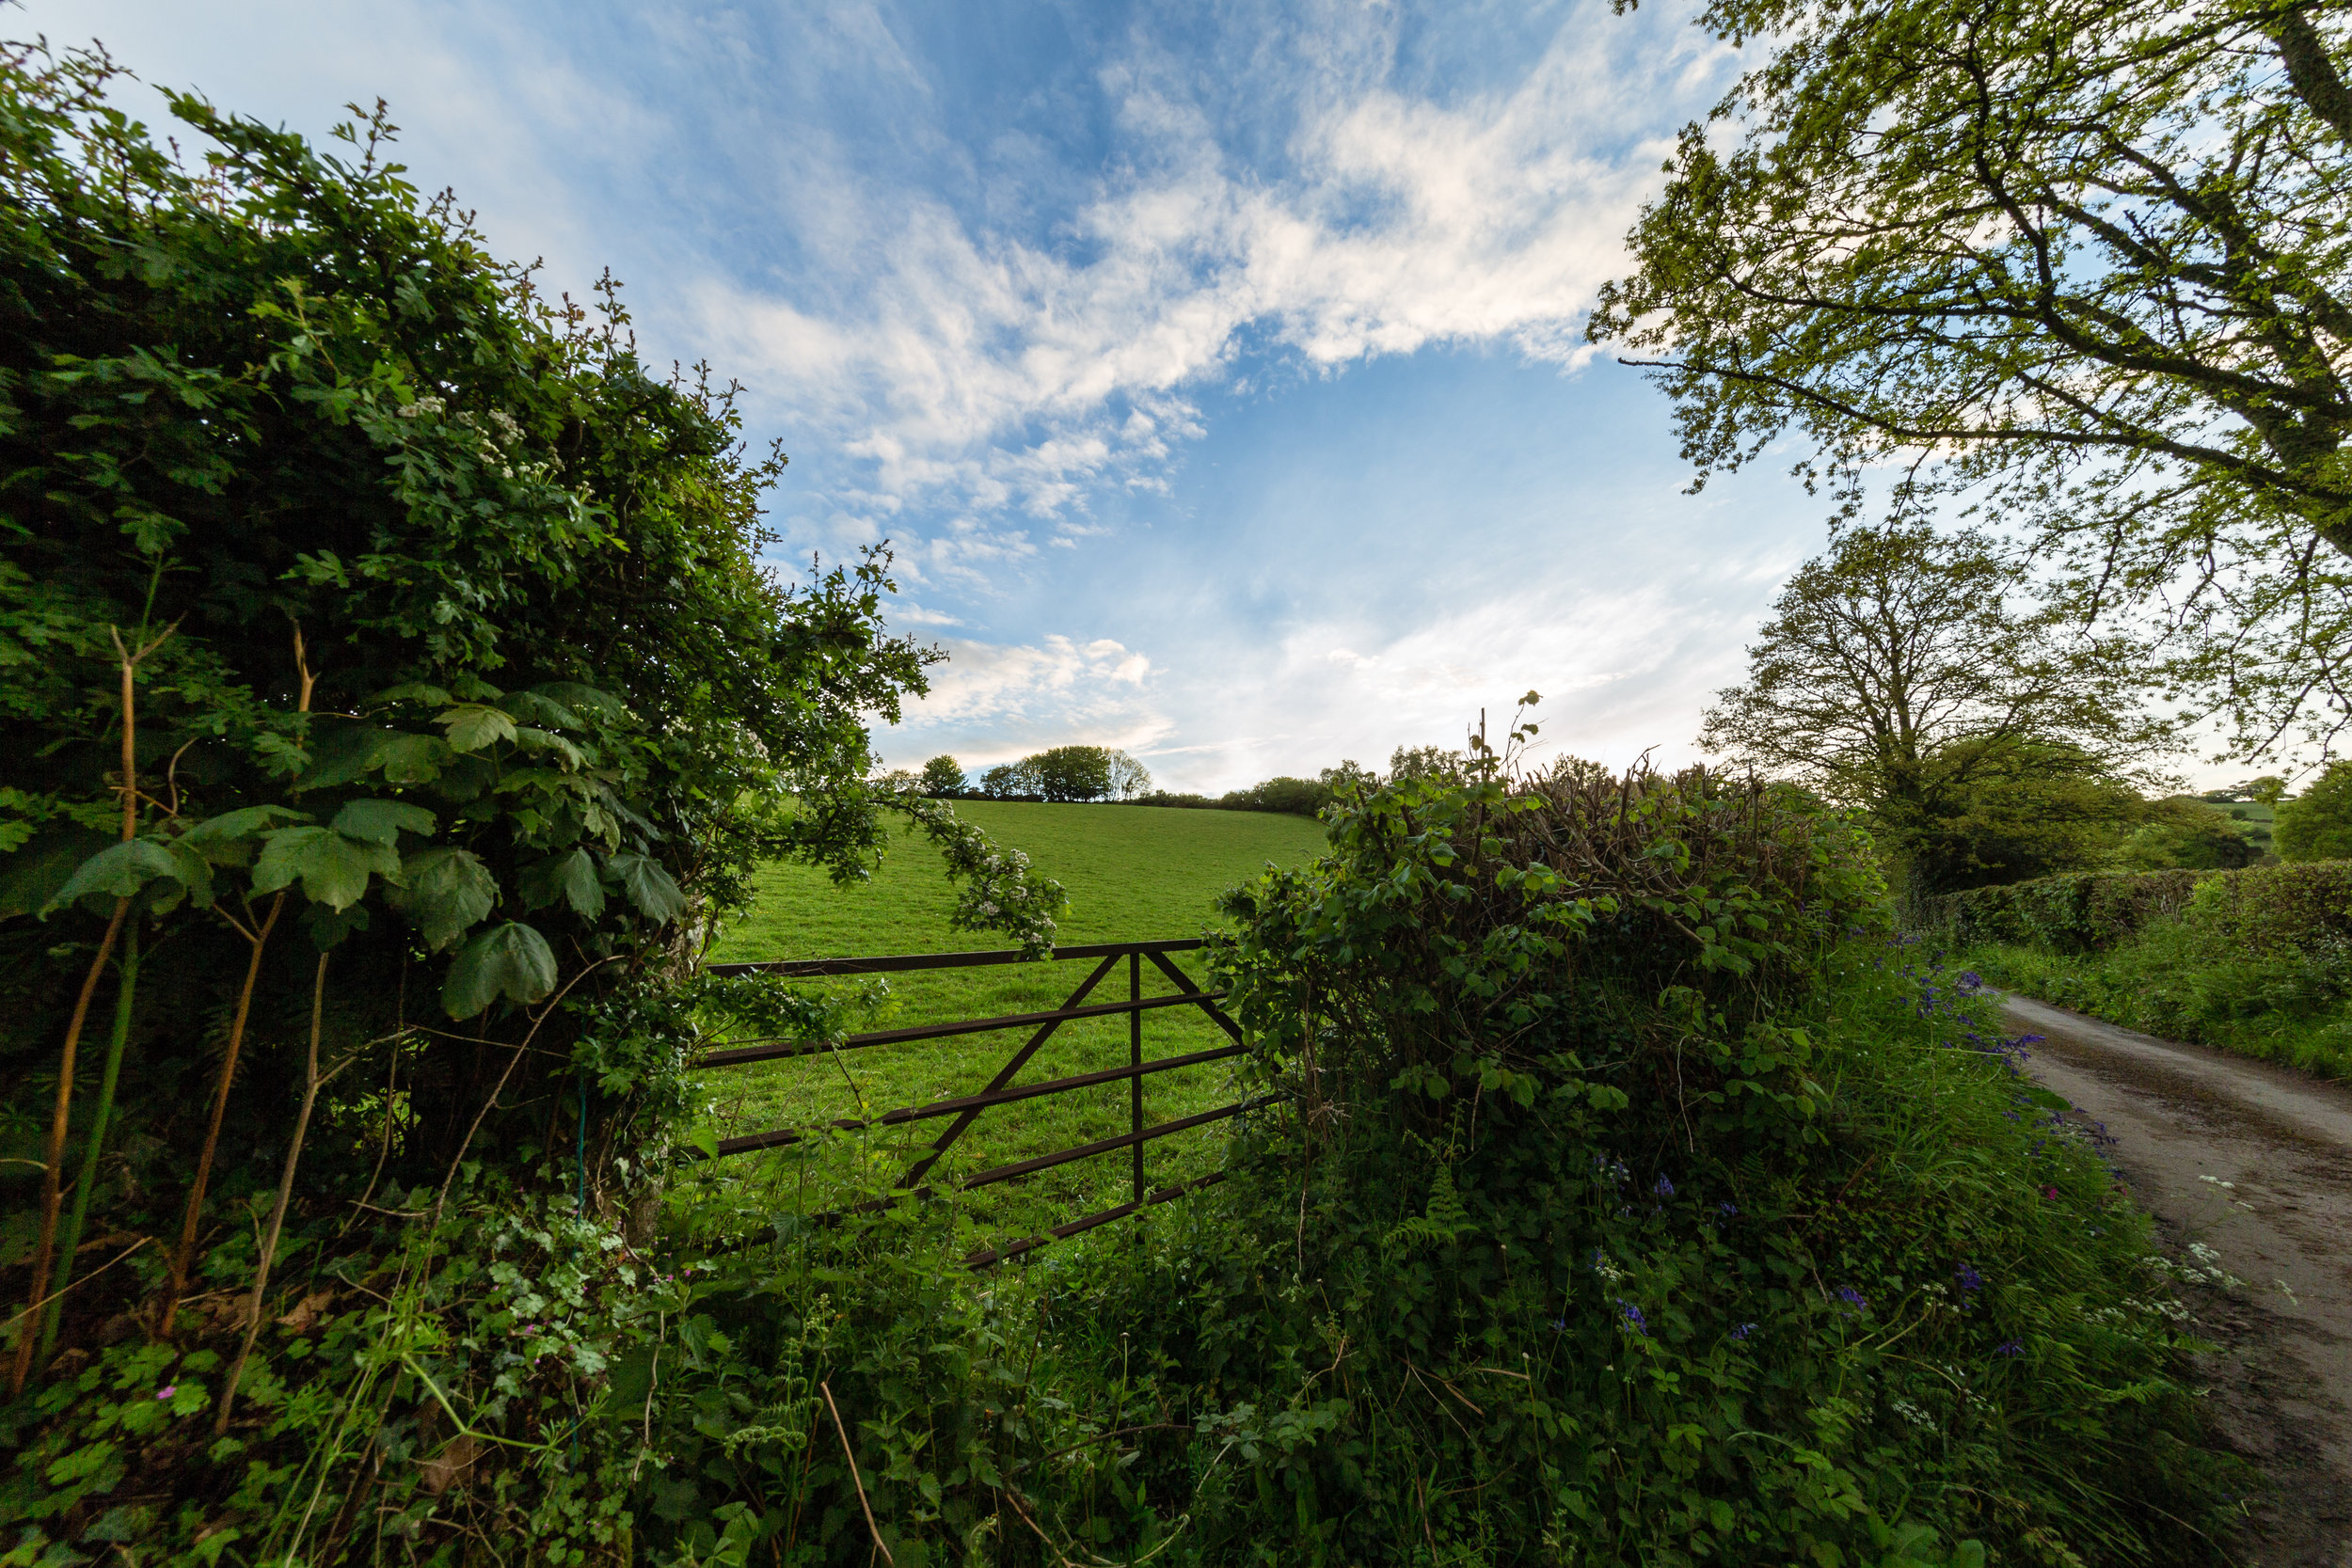 devon countryside farm gate